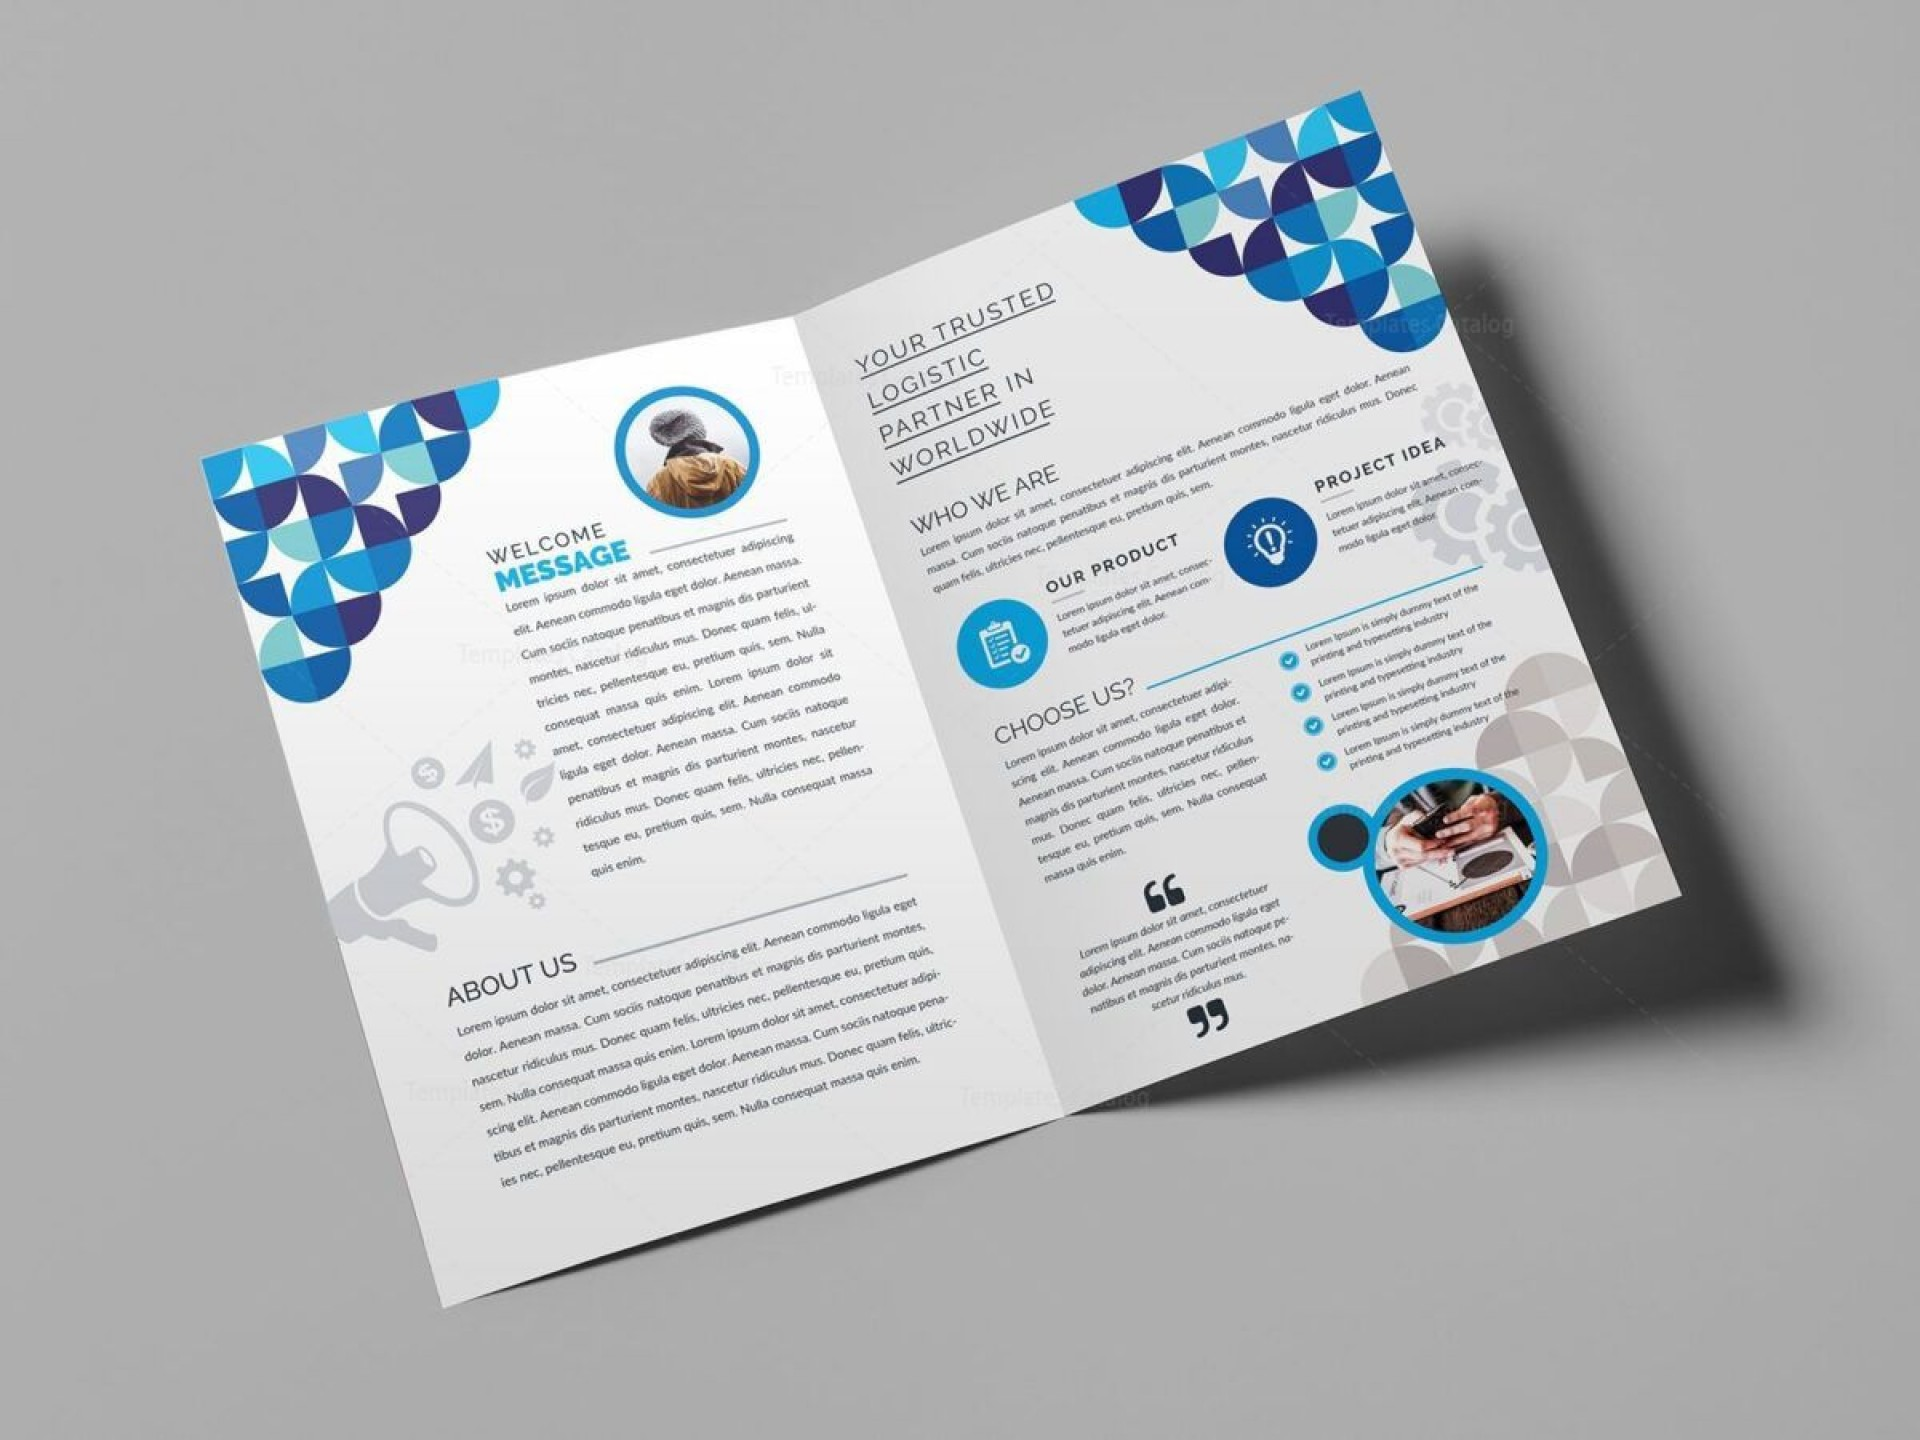 001 Wondrou Bi Fold Brochure Template Word High Resolution  Free Download Microsoft1920